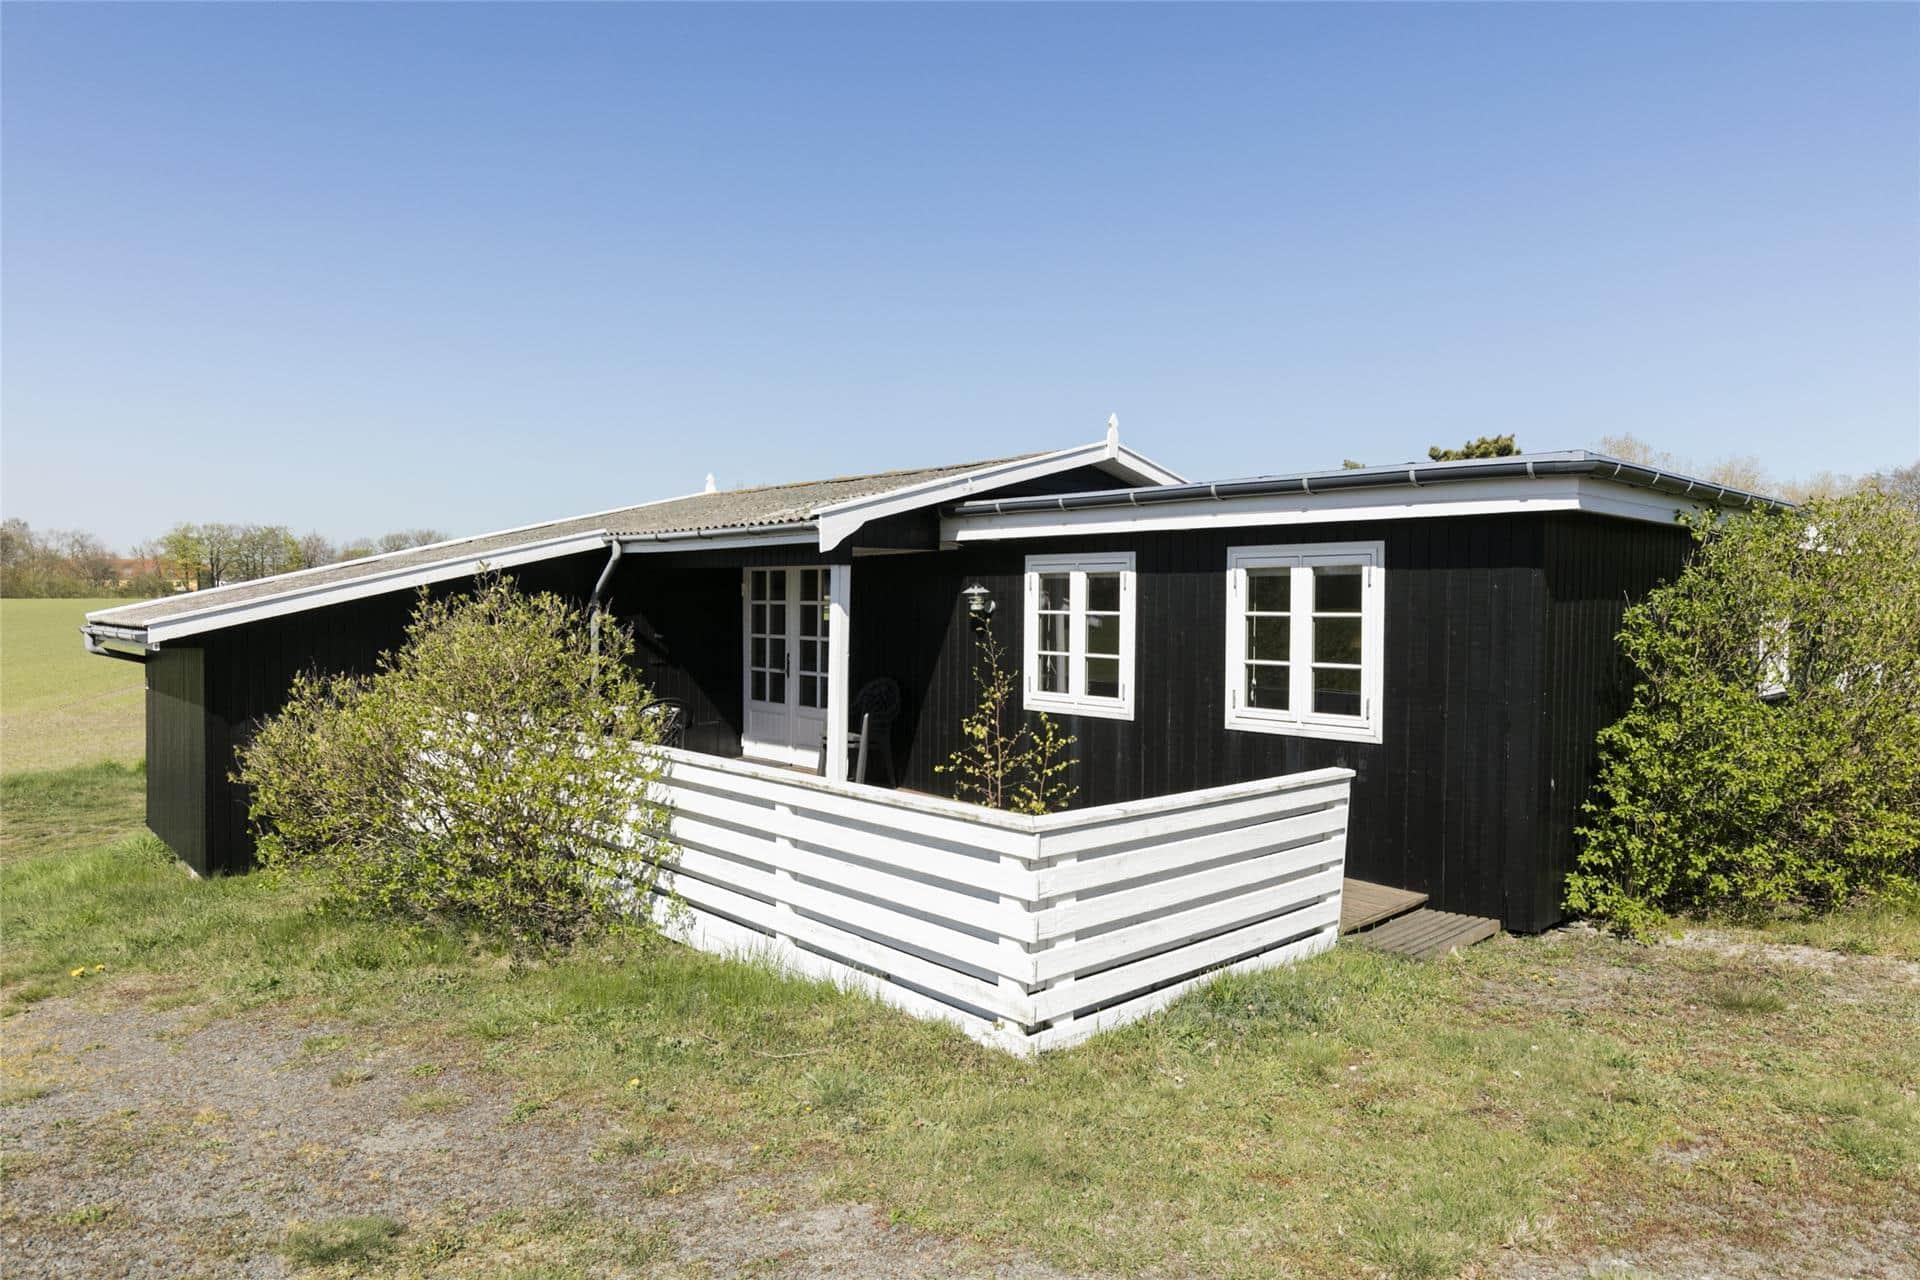 Billede 1-10 Sommerhus 4712, Boderne 57, DK - 3720 Aakirkeby